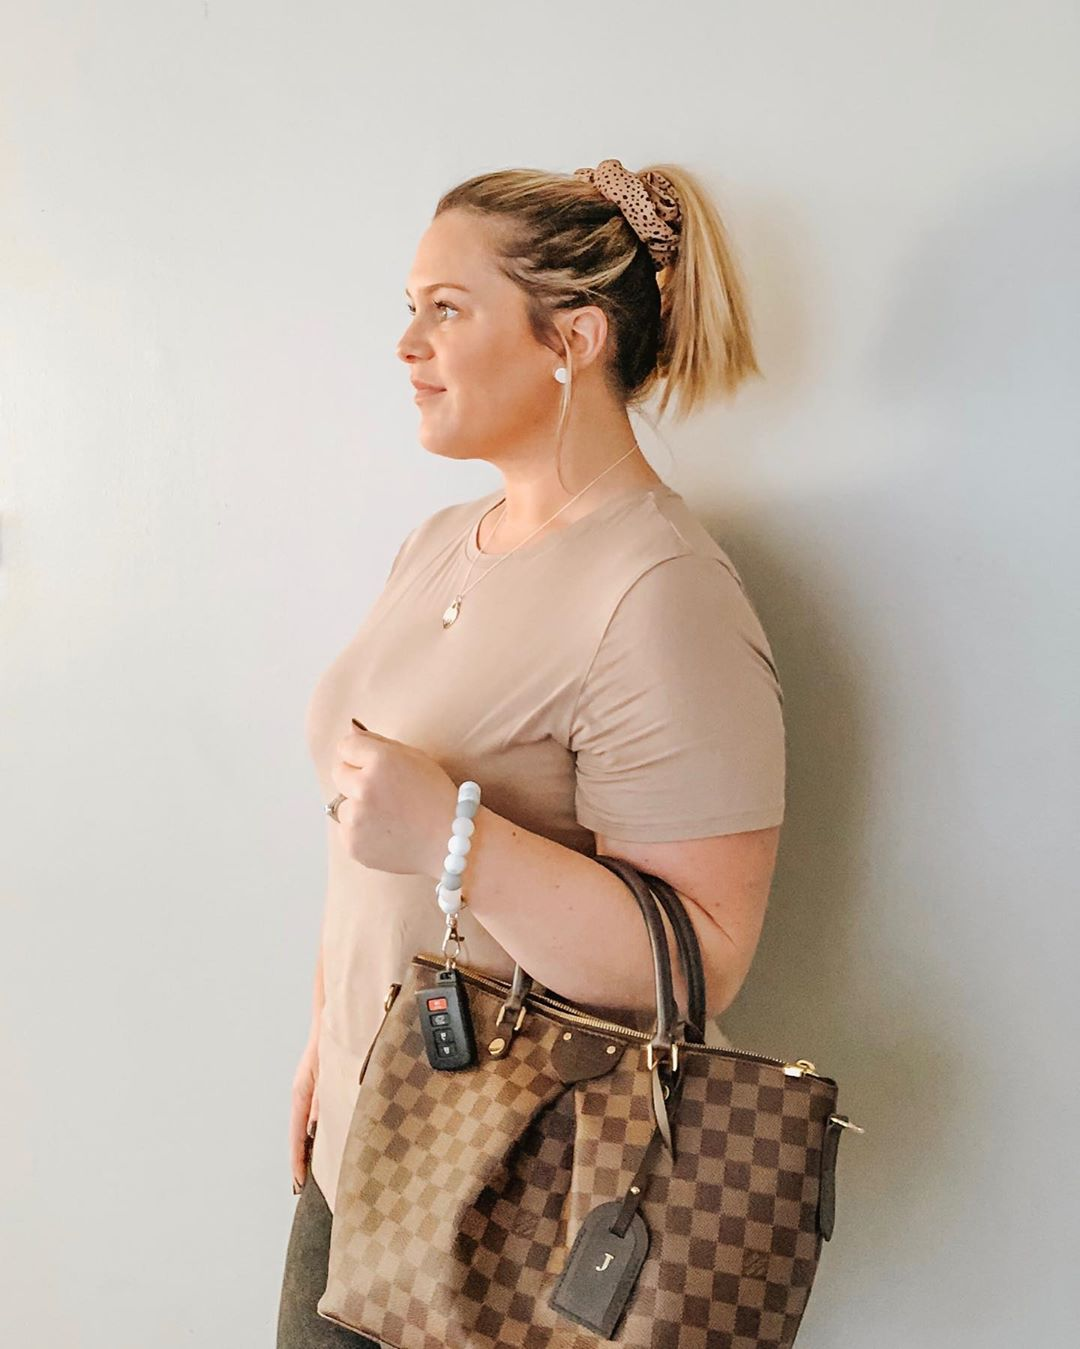 Strollin Into The Weekend Like ✌🏼! . . Braceletkeychains - Women Accessories